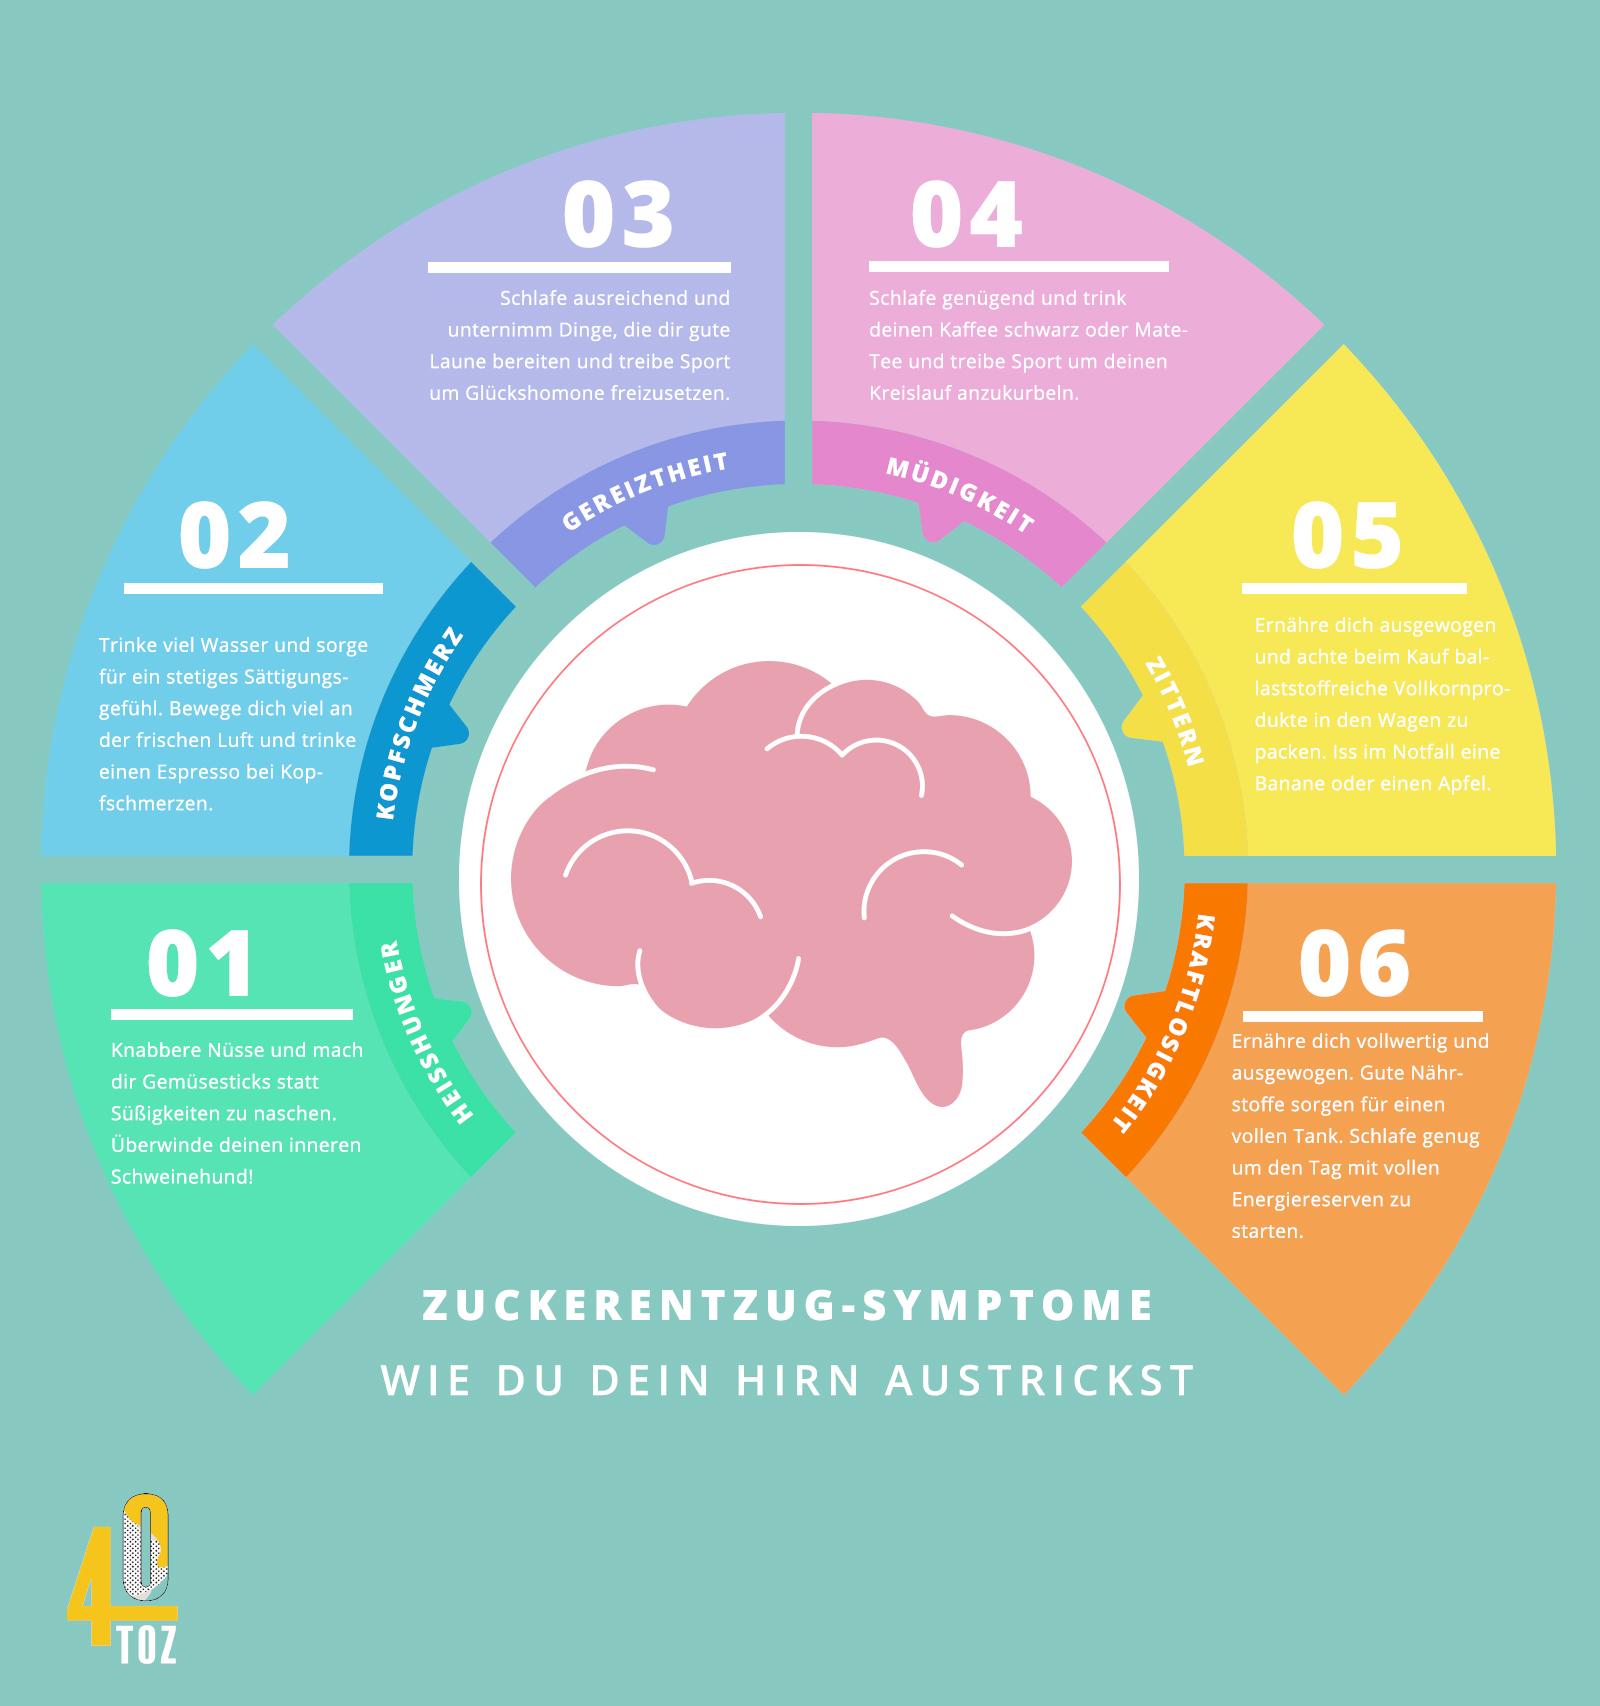 Zuckerentzug Symptome - Top Tipps